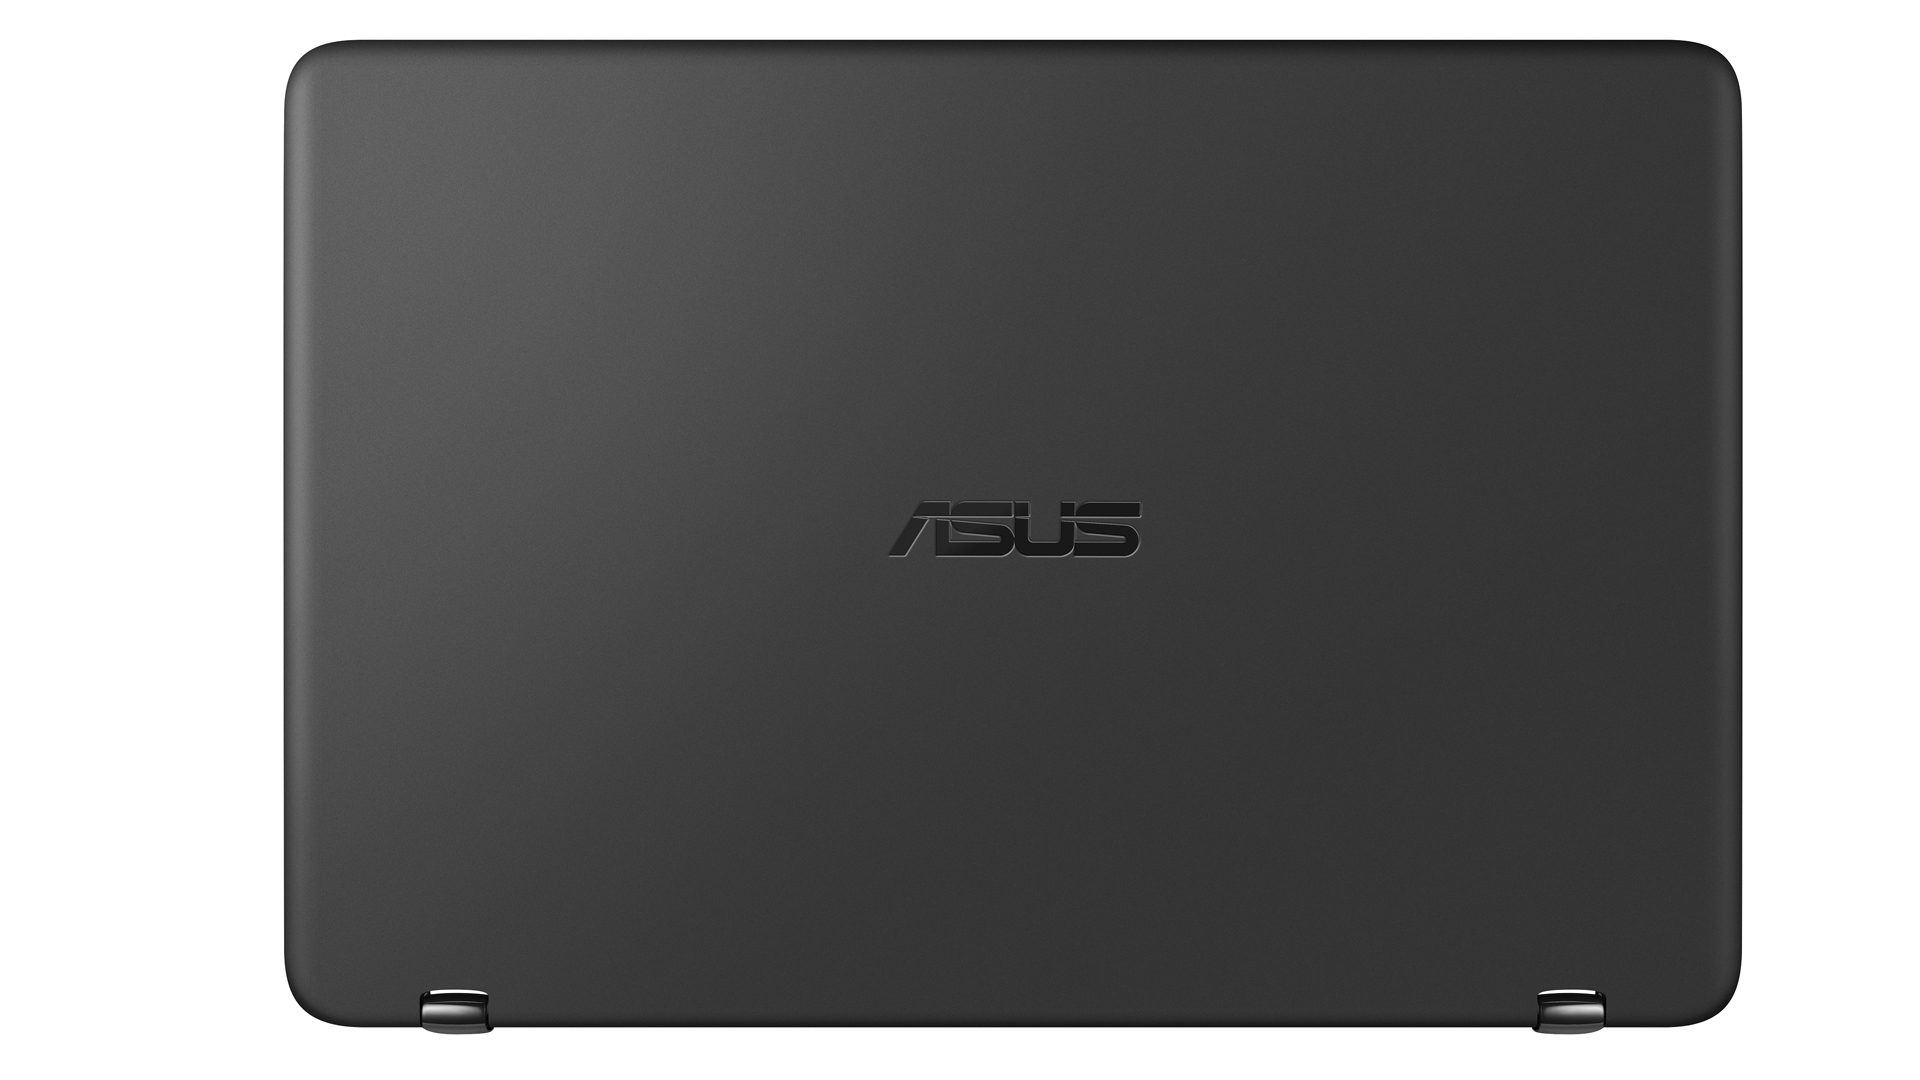 Asus-UX360UAK-BB284T-Zenbook—Ansichten-6